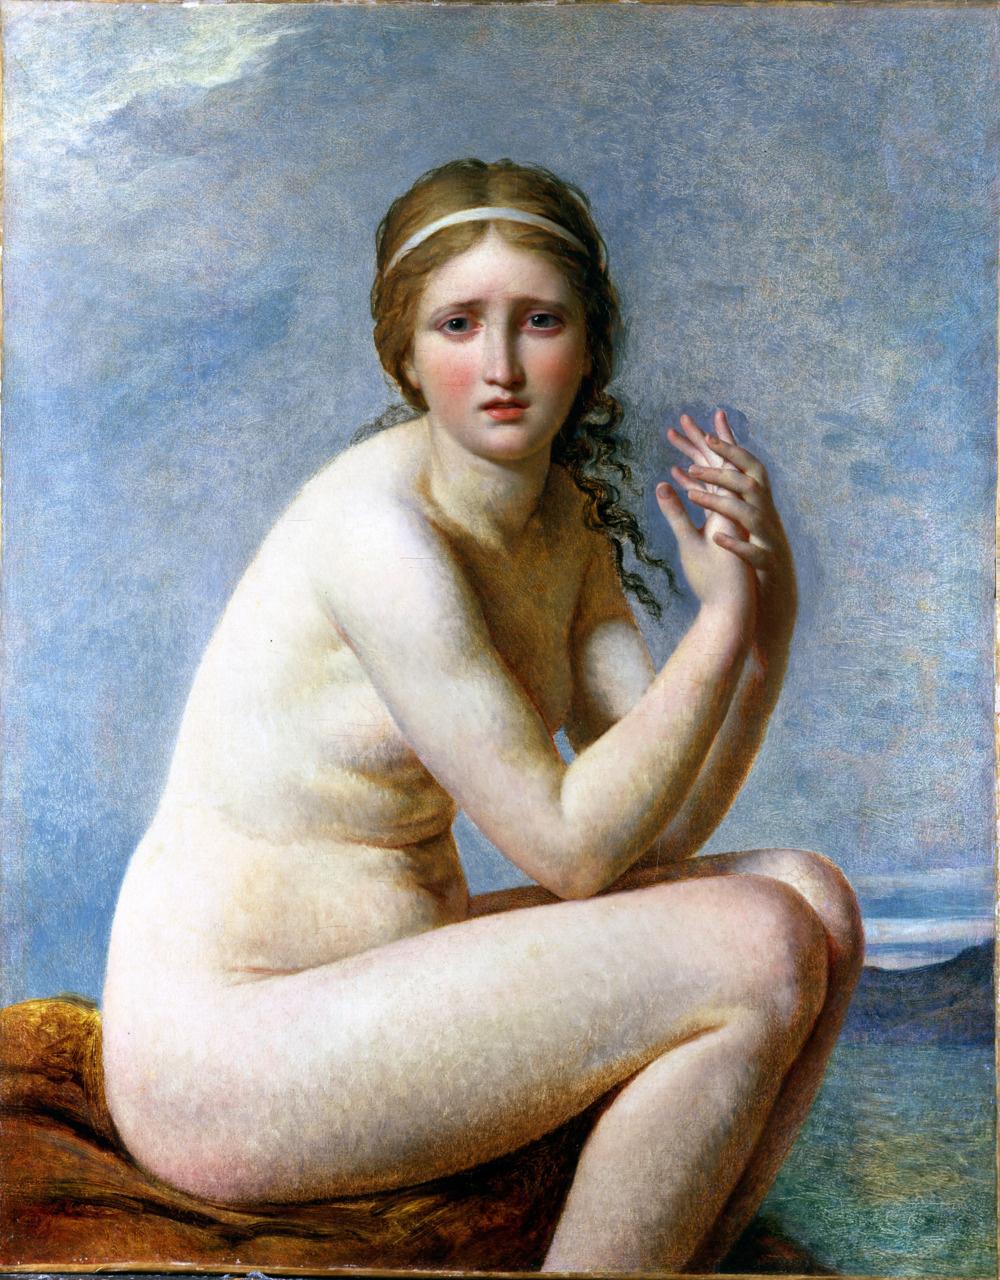 Nude renaissance, hank hill an wife naked